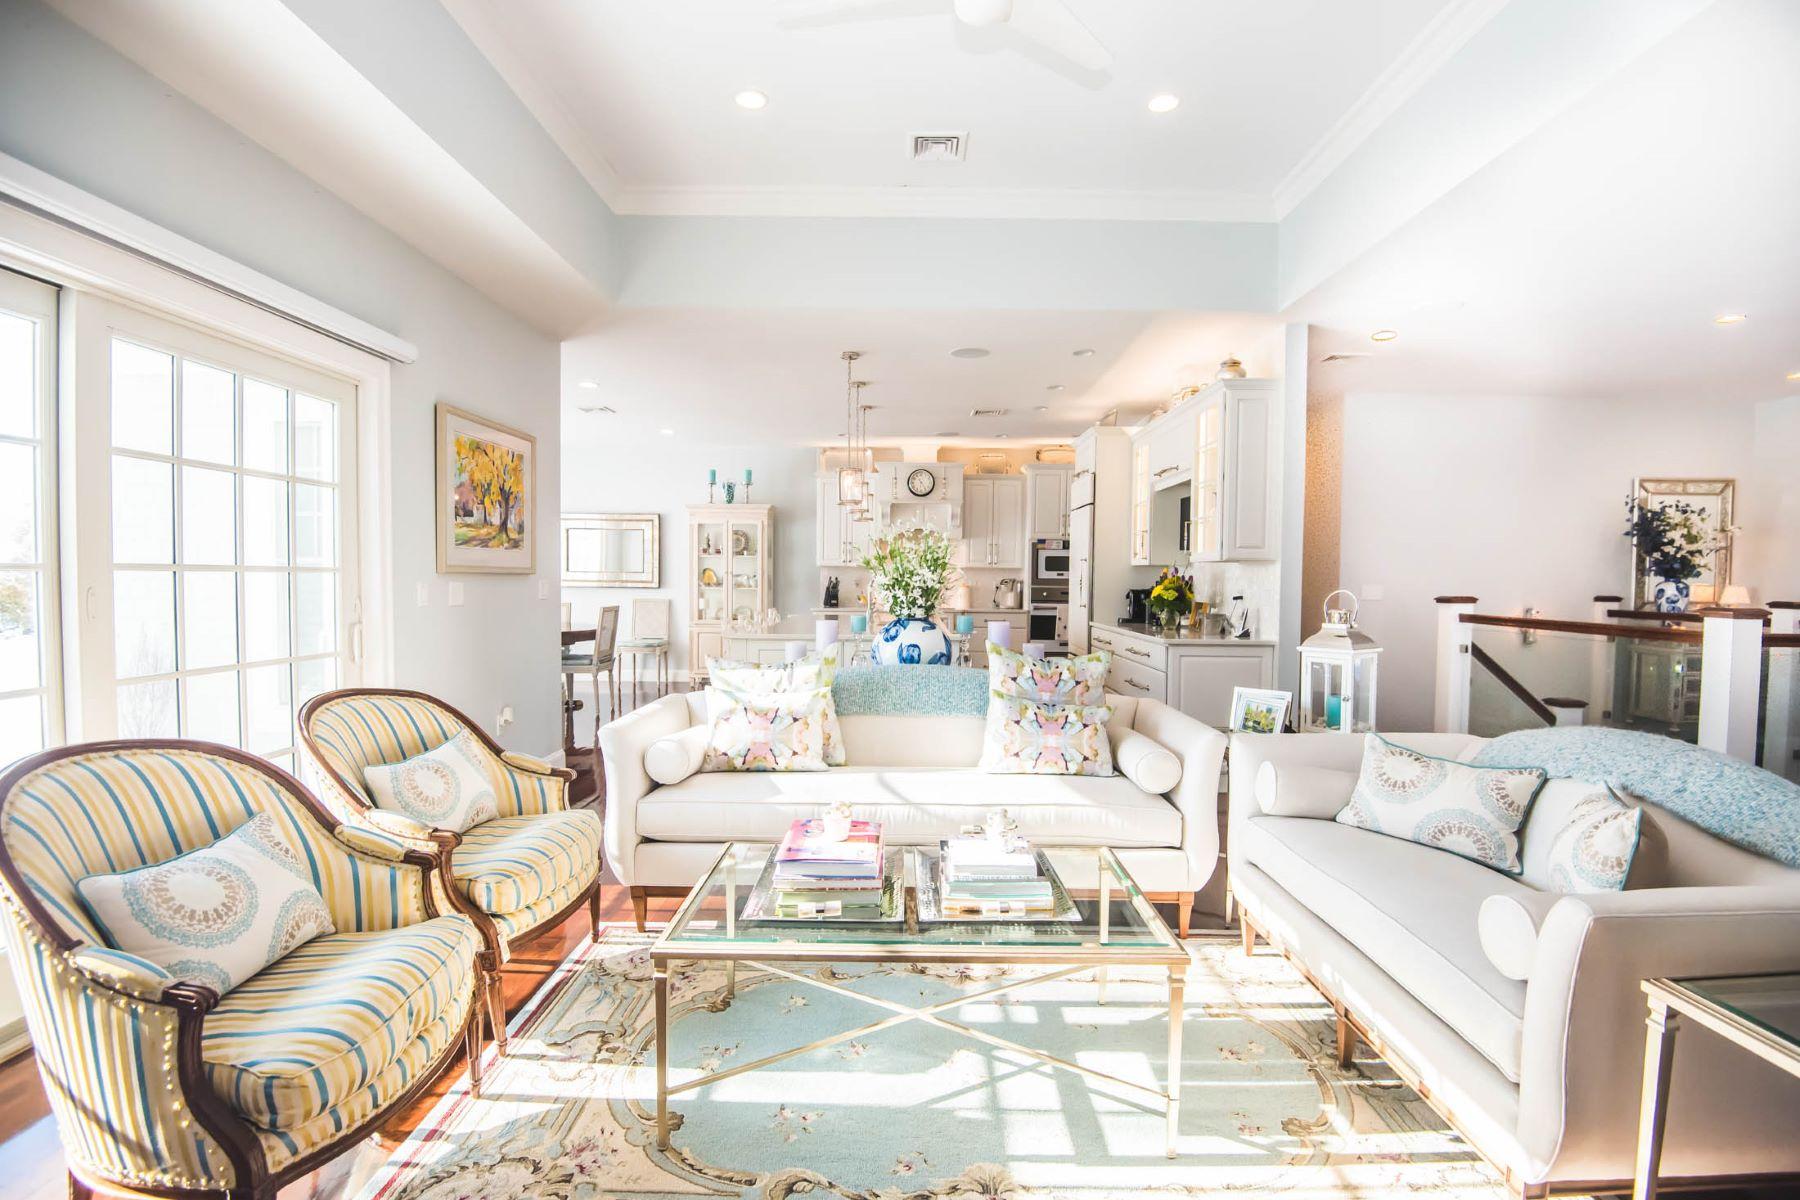 Single Family Homes for Active at Cook Estate 22 Eldredge Lane Cohasset, Massachusetts 02025 United States